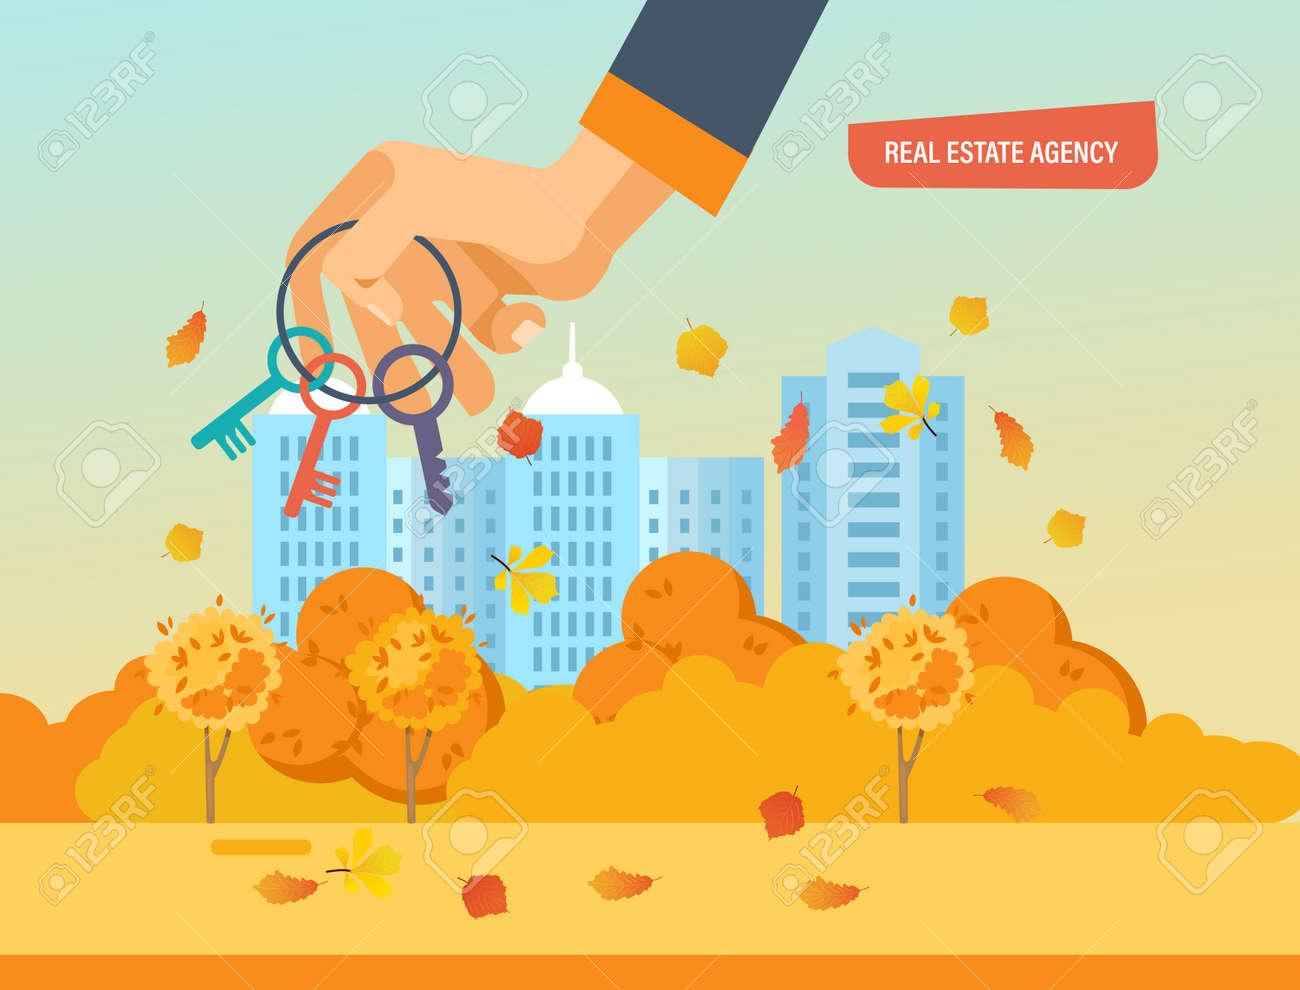 investissement immobilier ou acheter